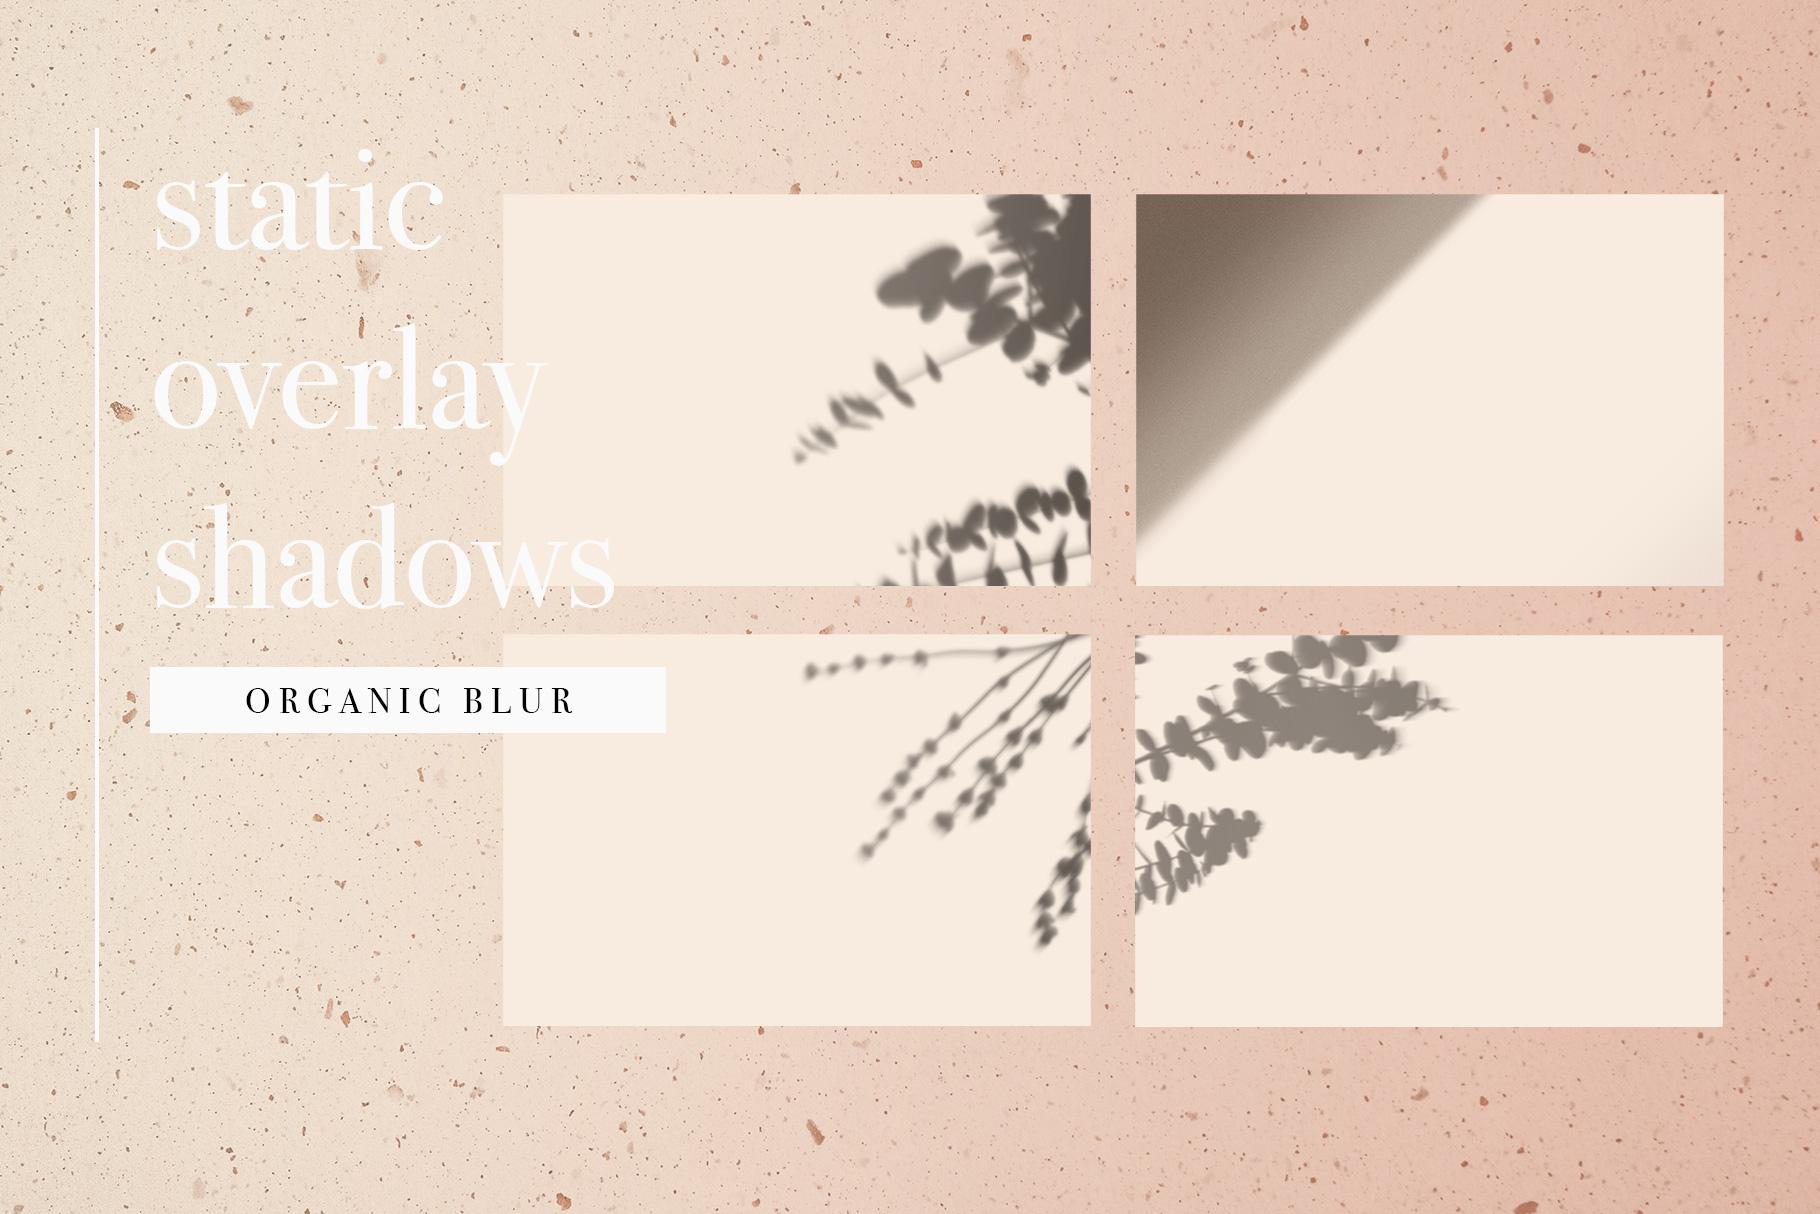 04-organic-shadow-overlay-mockup-palm-leaves-animation